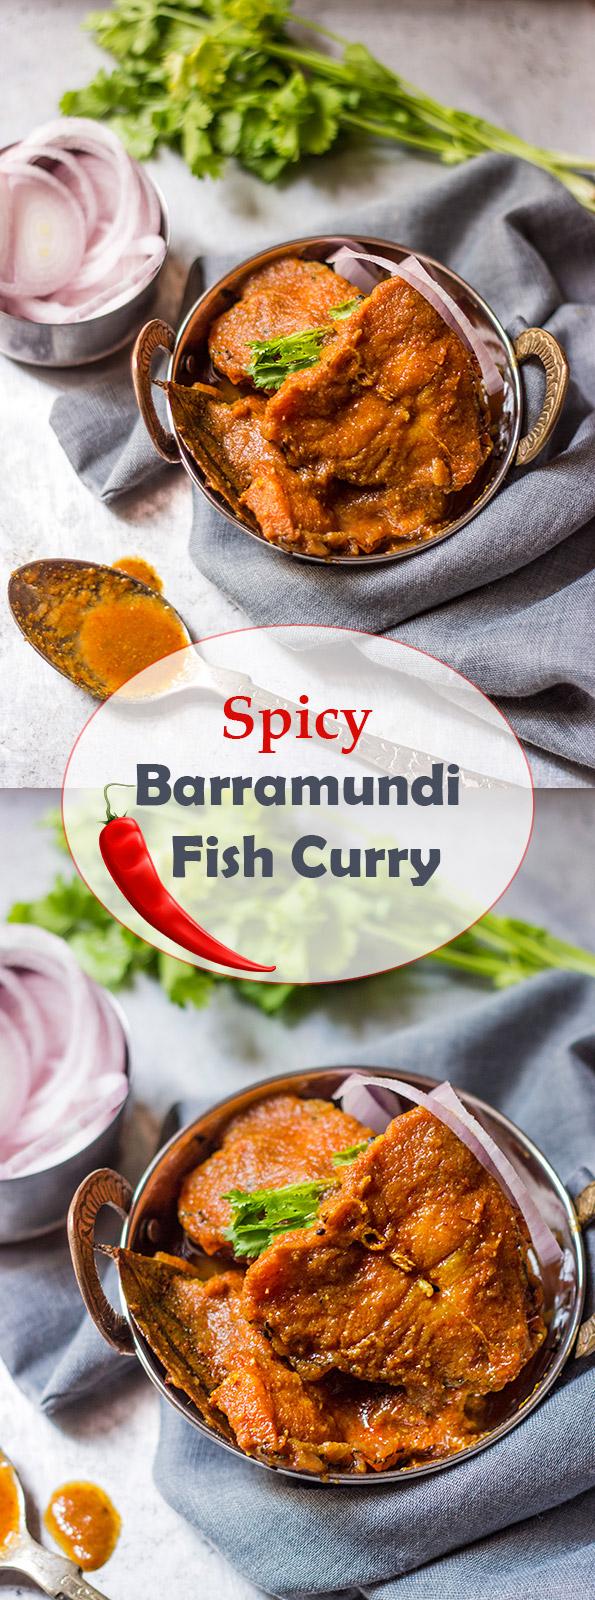 Bhetki Mach Er Kalia Spicy Barramundi Fish Curry Not Out Of The Box